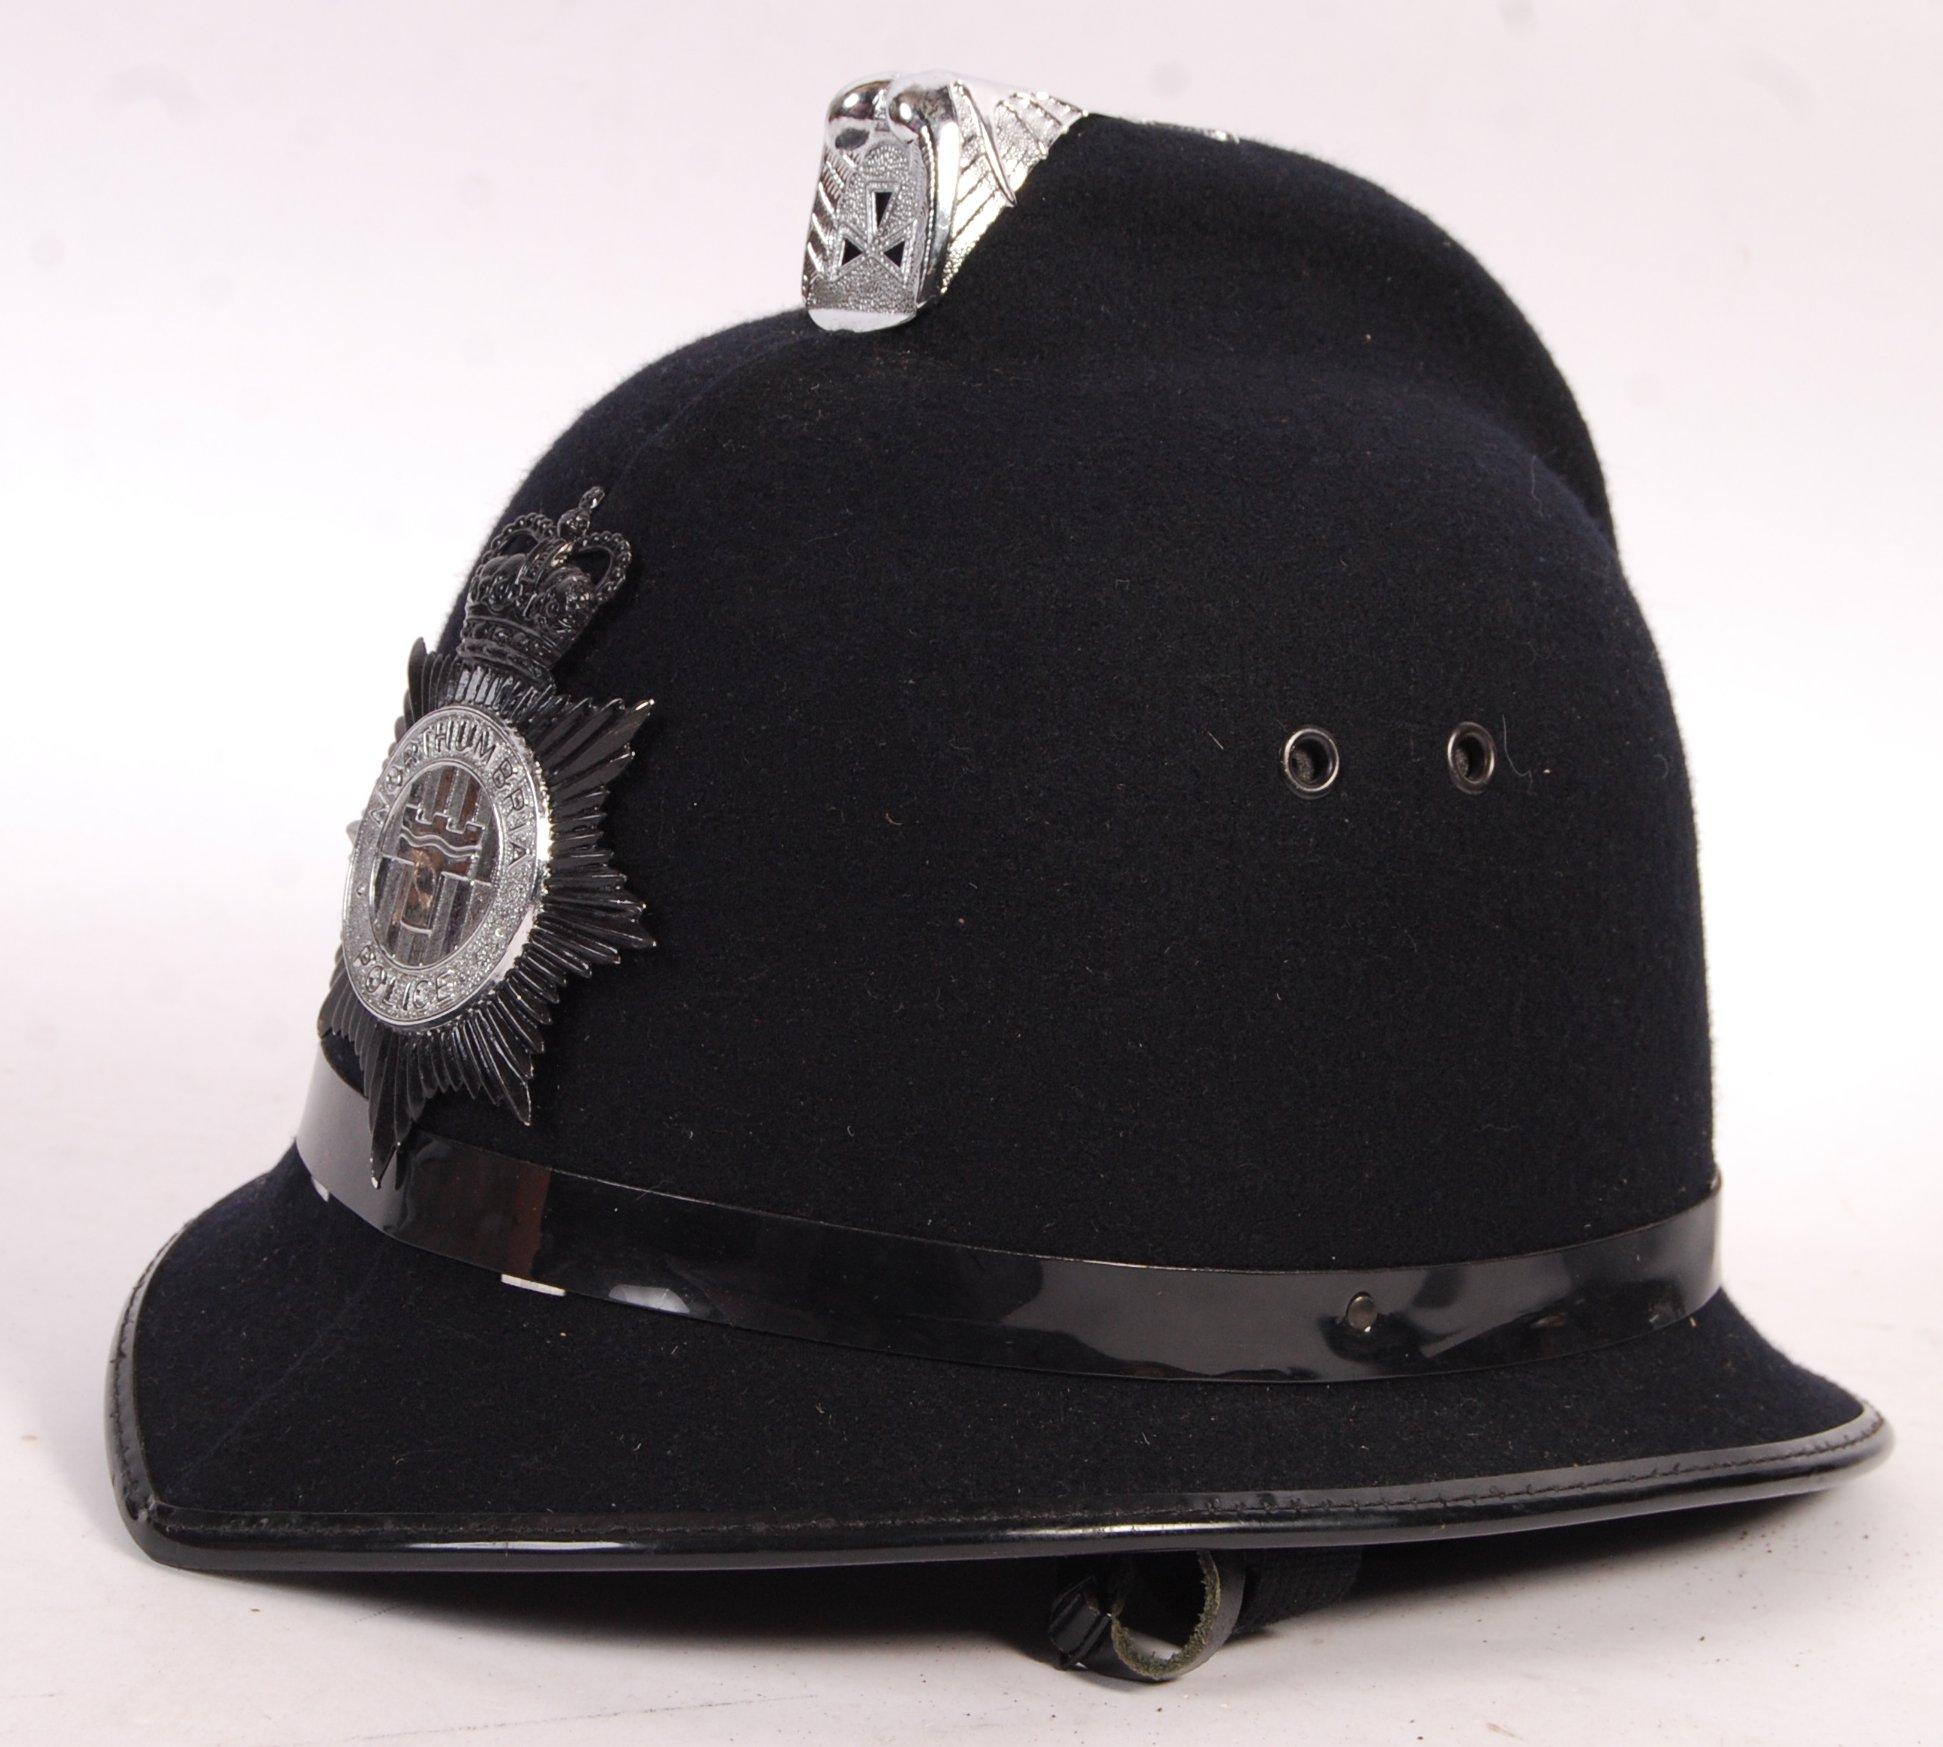 Lot 197 - 20TH CENTURY NORTHUMBRIA POLICE UNIFORM HELMET